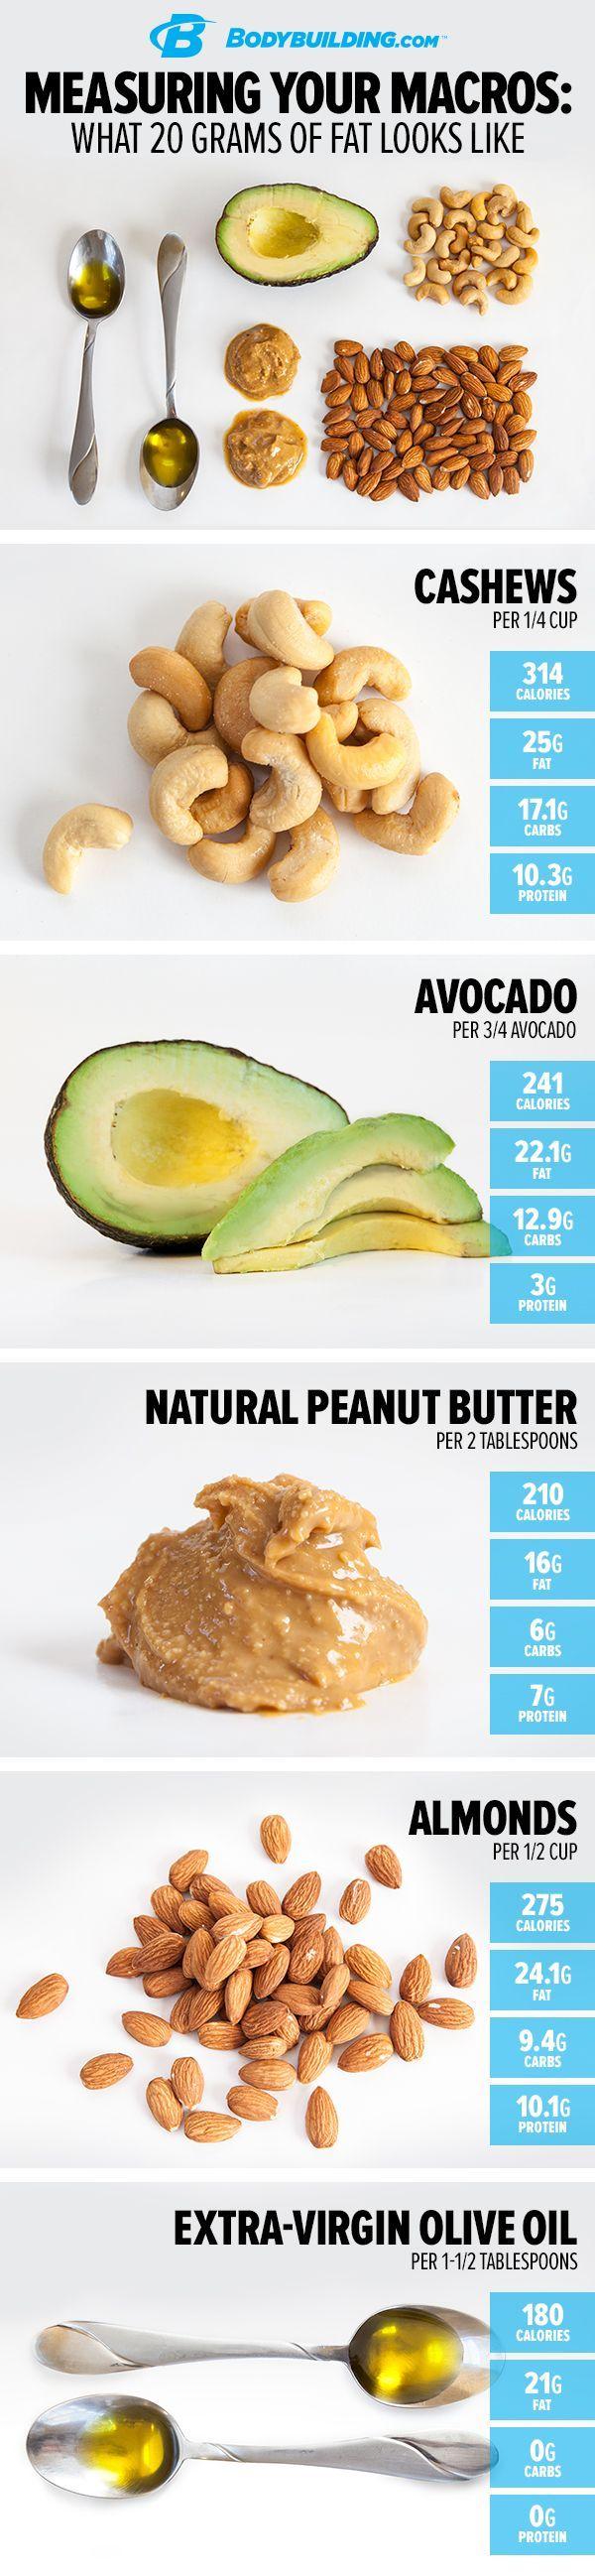 Weight loss seeds